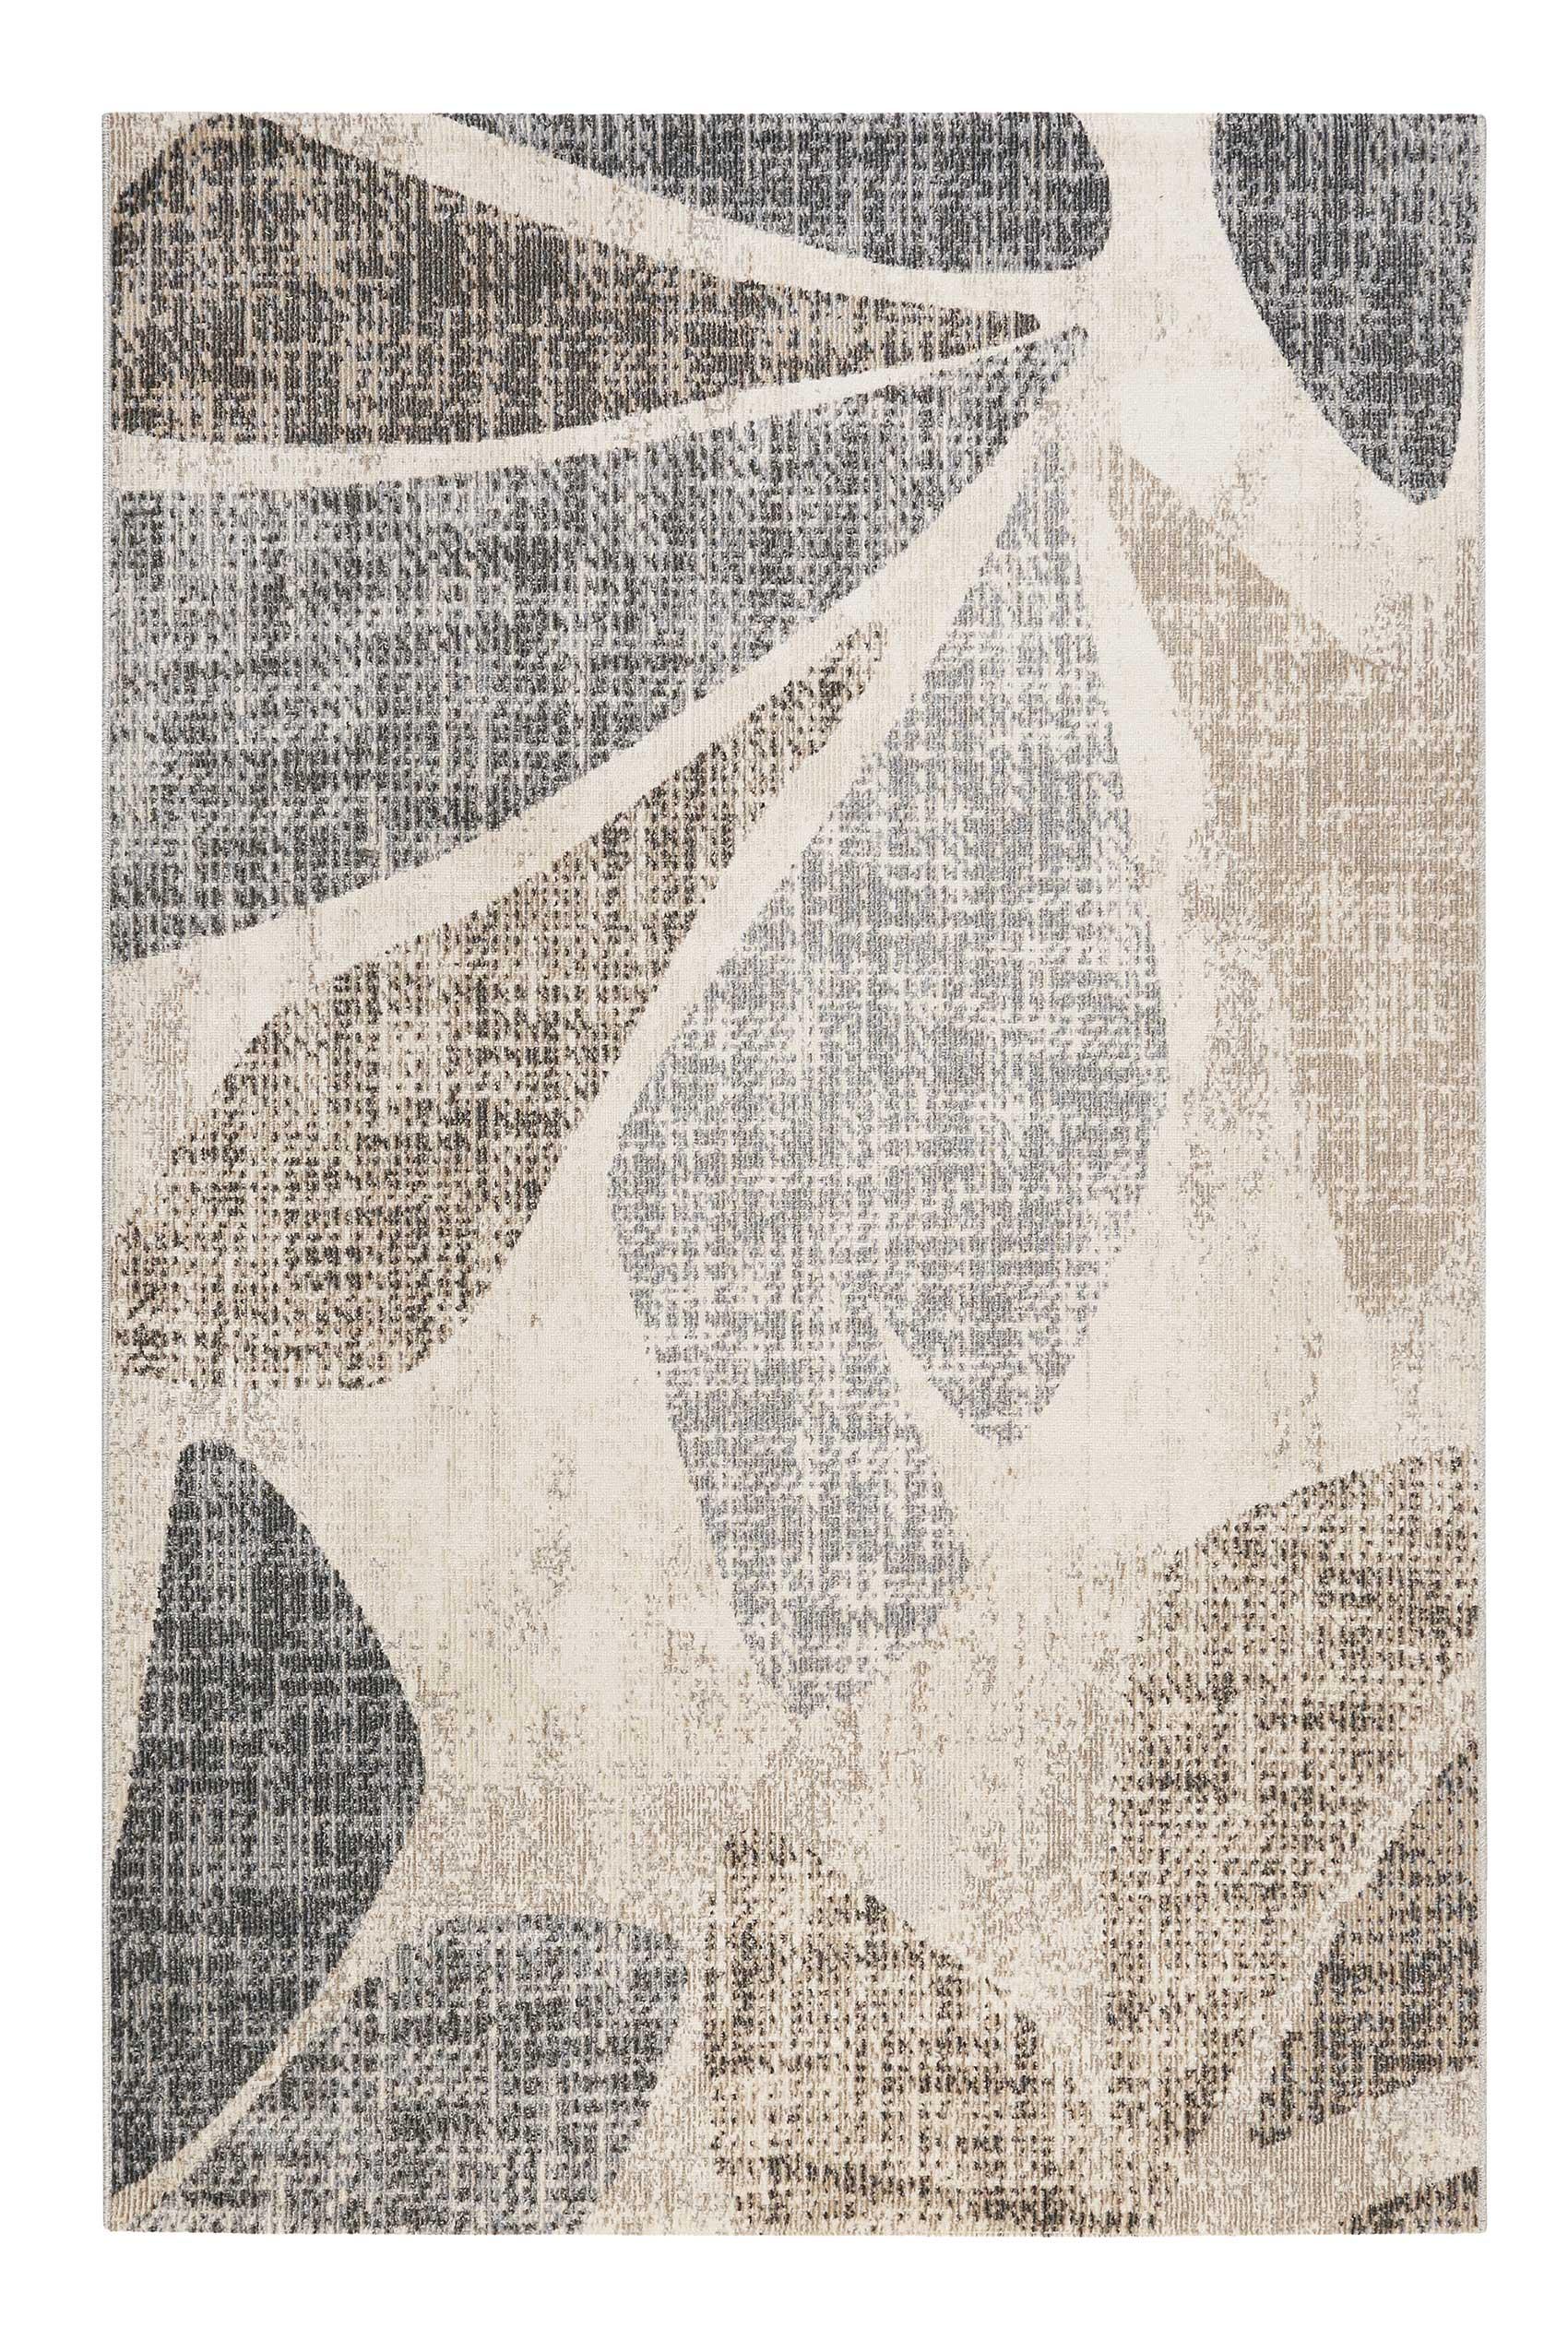 Tapis in/outdoor design inspiration nature gris beige marron 120x170